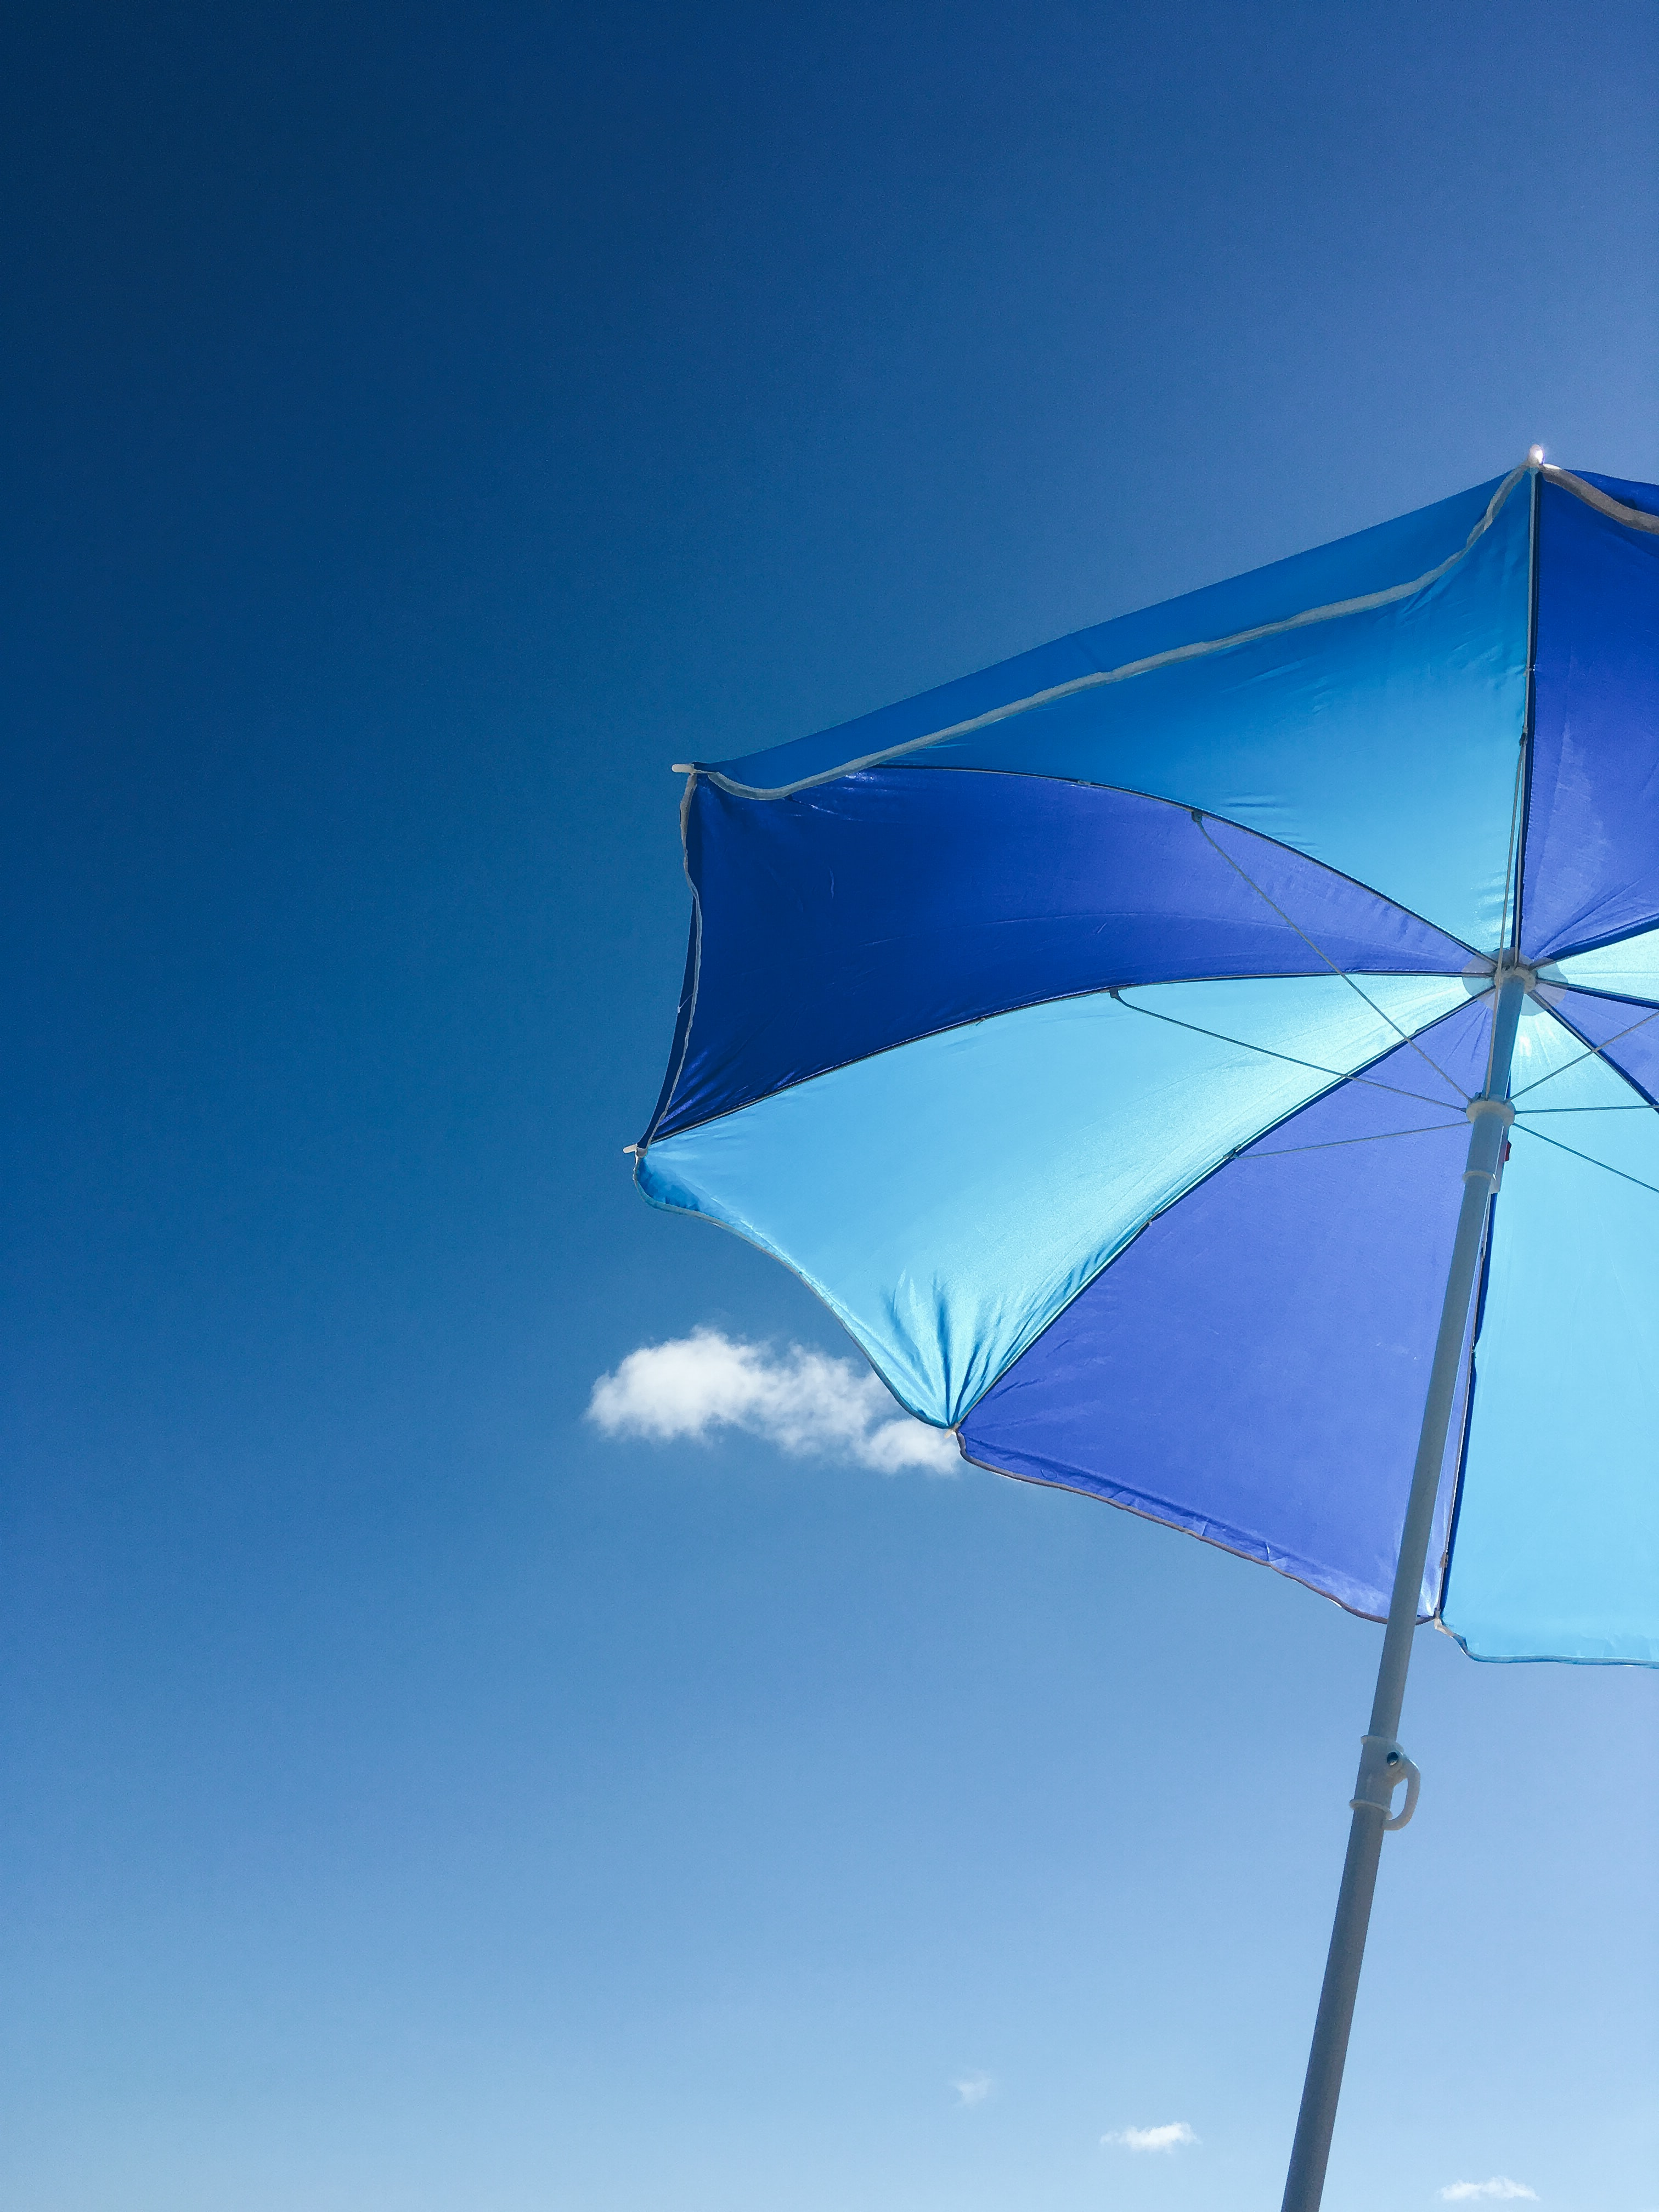 worms-eye-view of blue patio umbrella